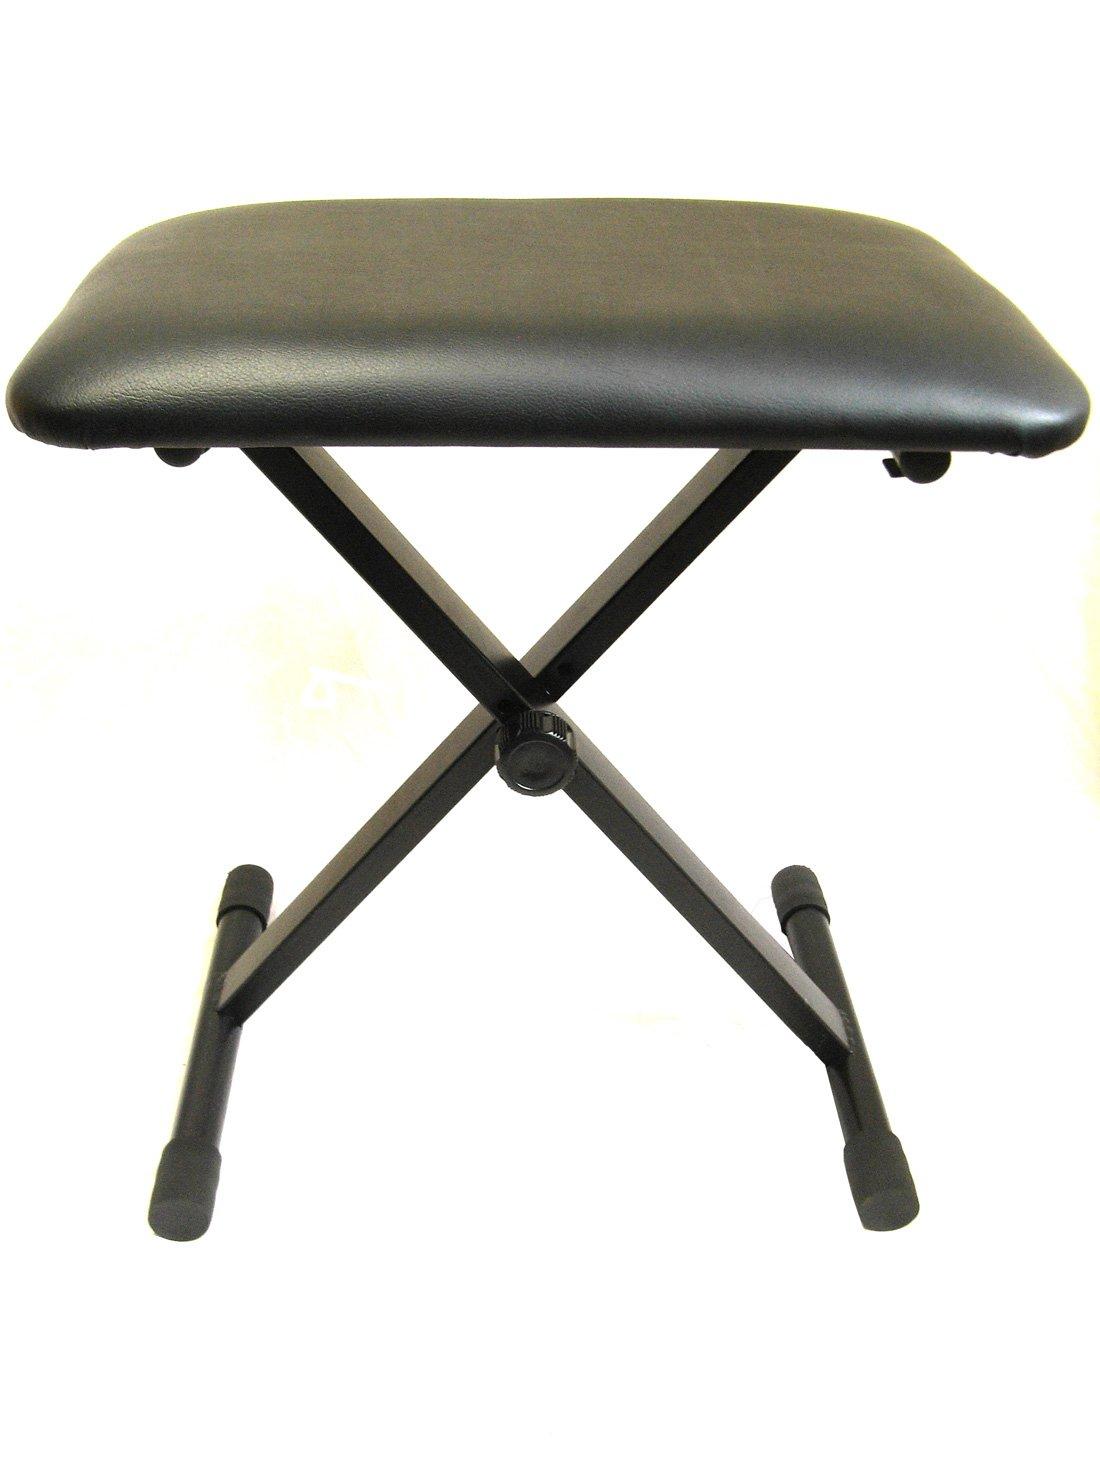 Tone Deaf Music Keyboard Bench. Adjustable, folding piano stool / seat KB01